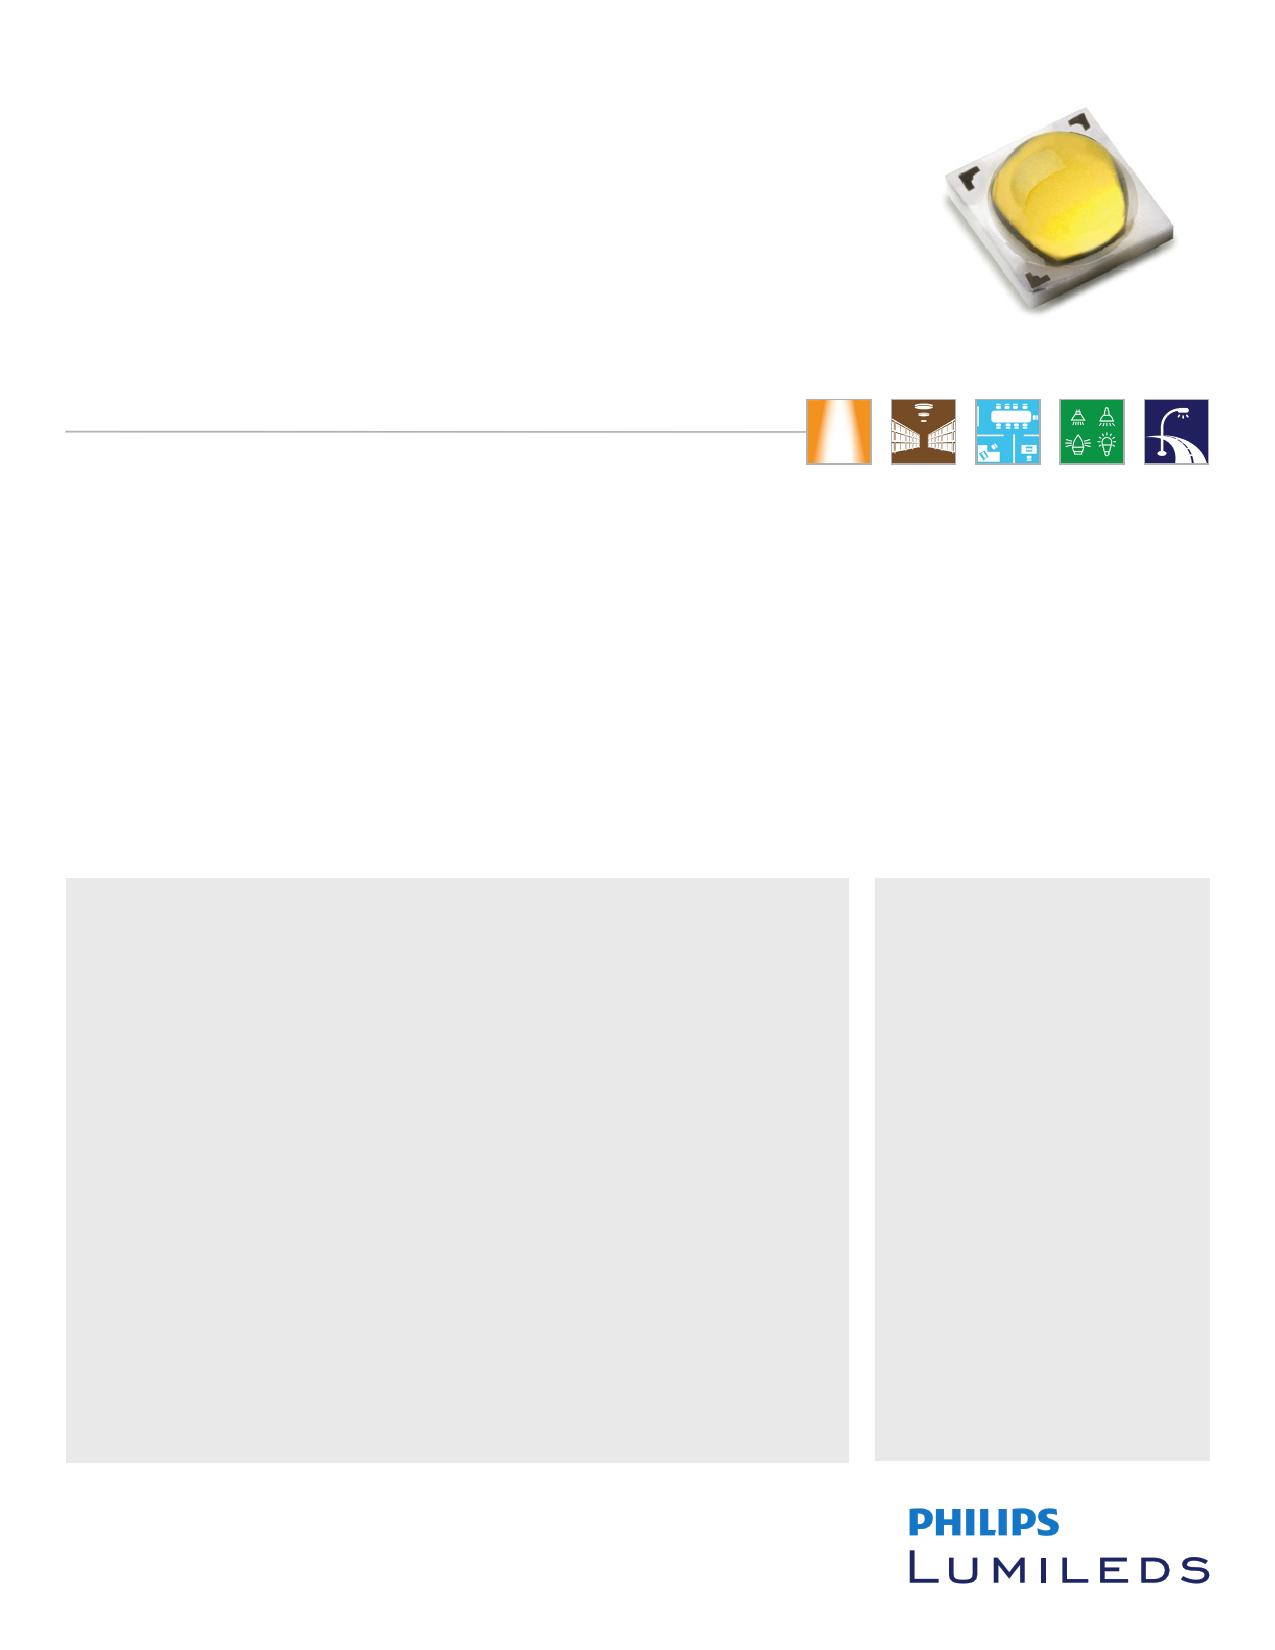 L1T2-5085000000000 datasheet